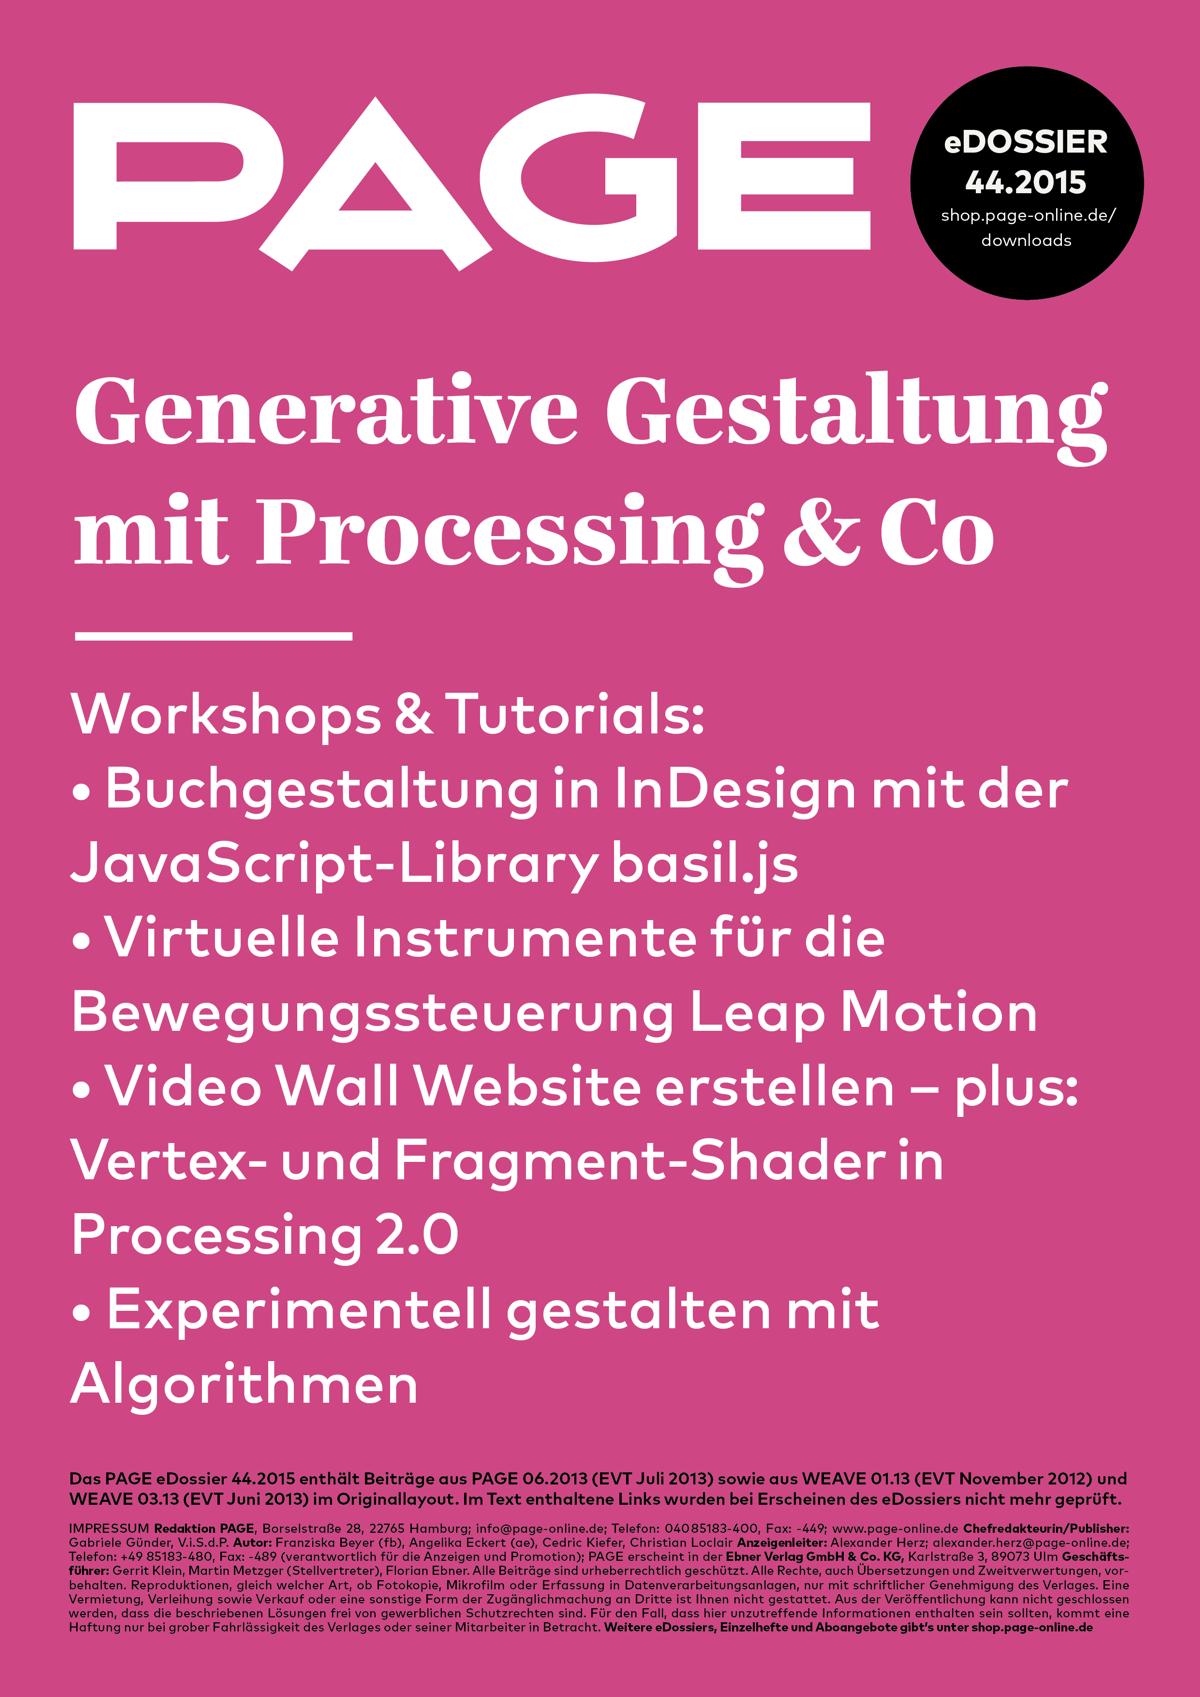 Generative Gestaltung, Processing, Datenvisualisierung, Interaction Design, Digital Design